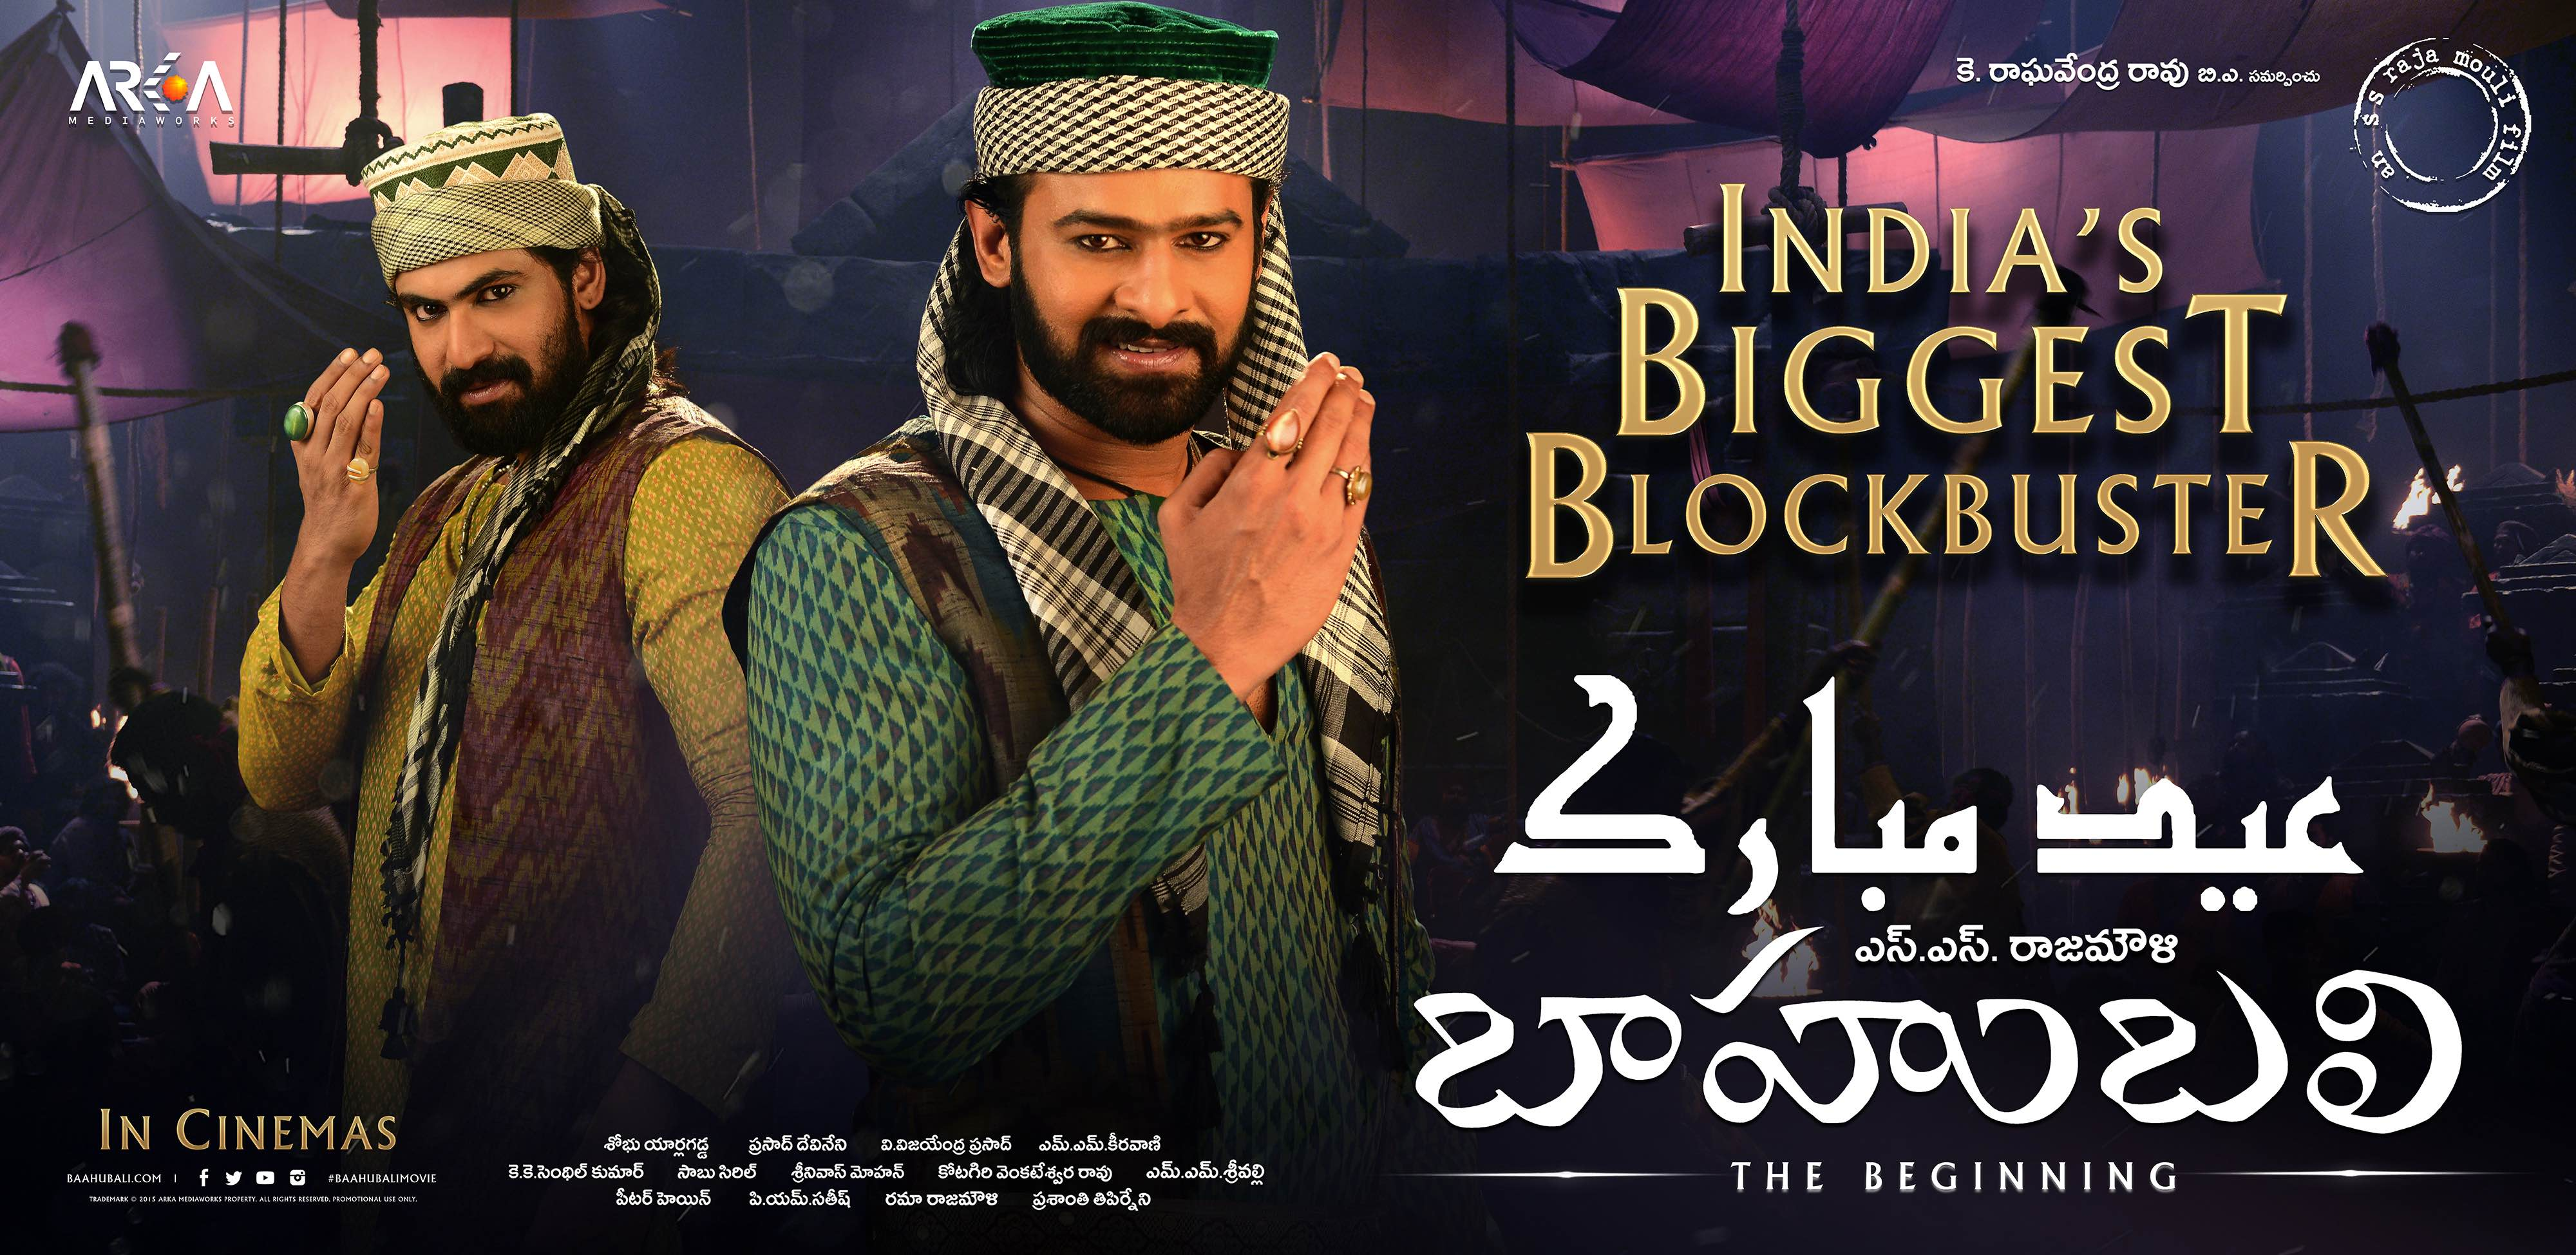 baahubali-movie-arabic-poster-exclusive-details